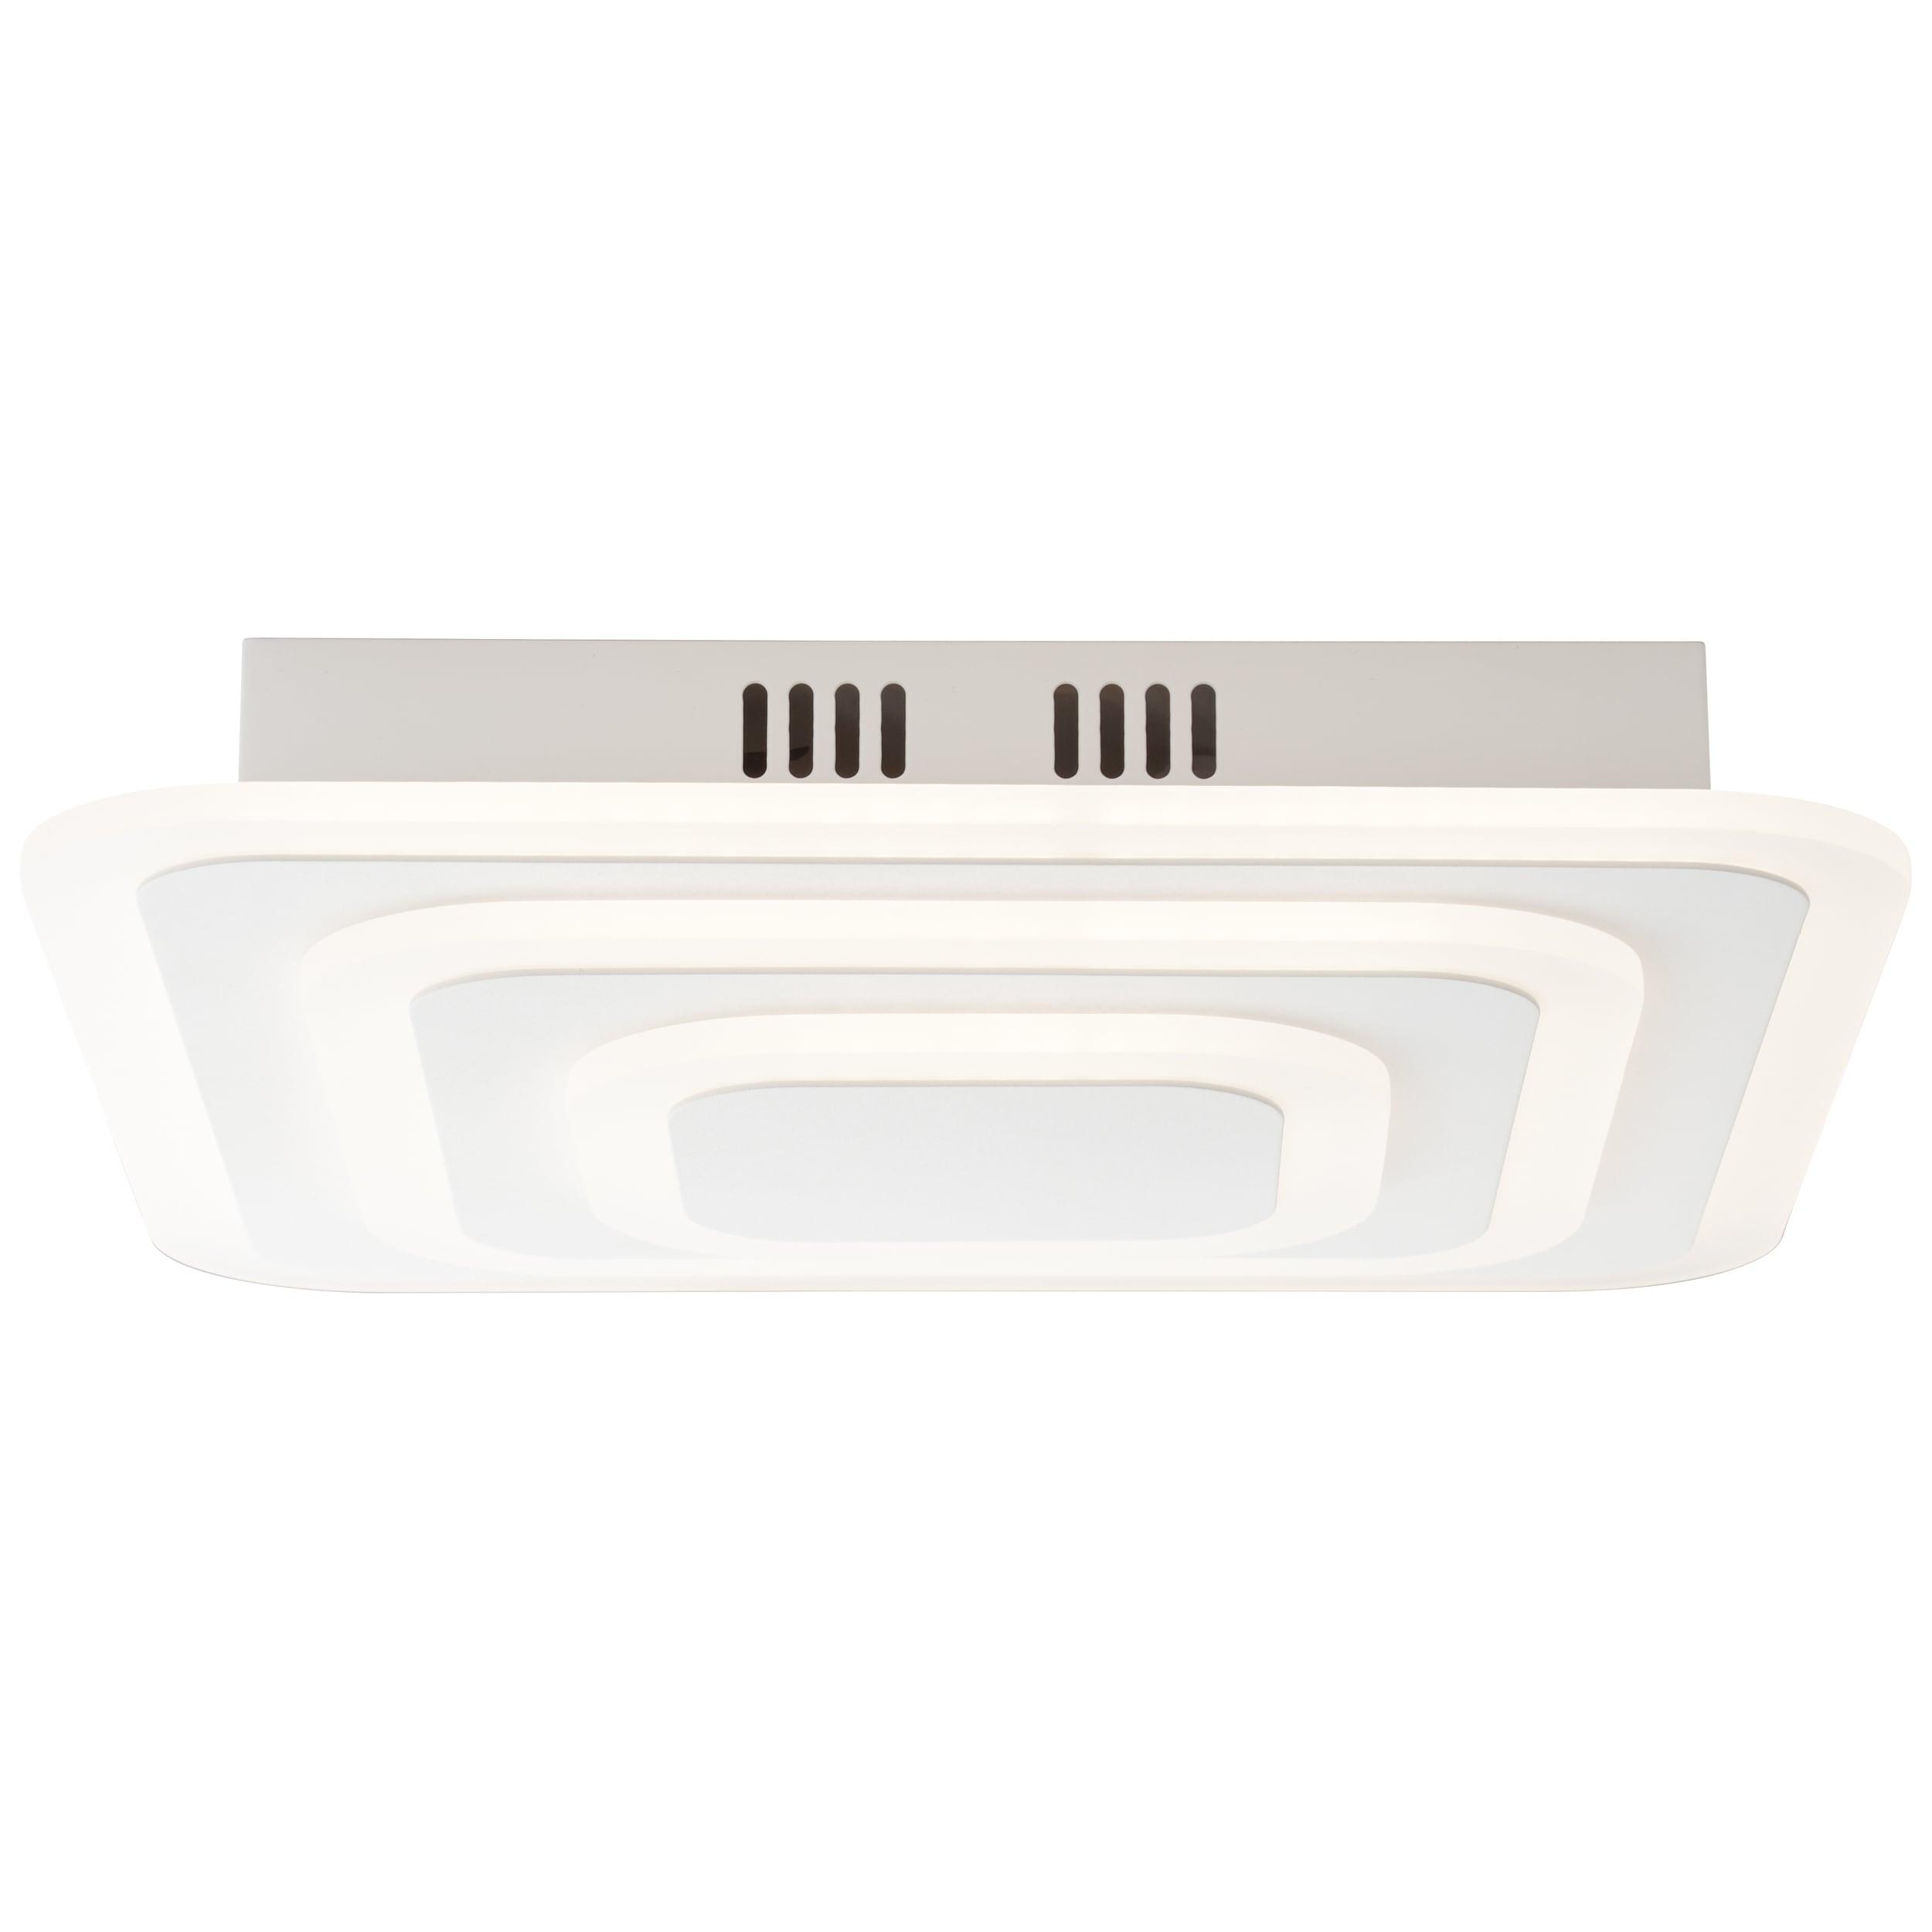 AEG Caresa LED Deckenleuchte 37x37cm sand/weiß